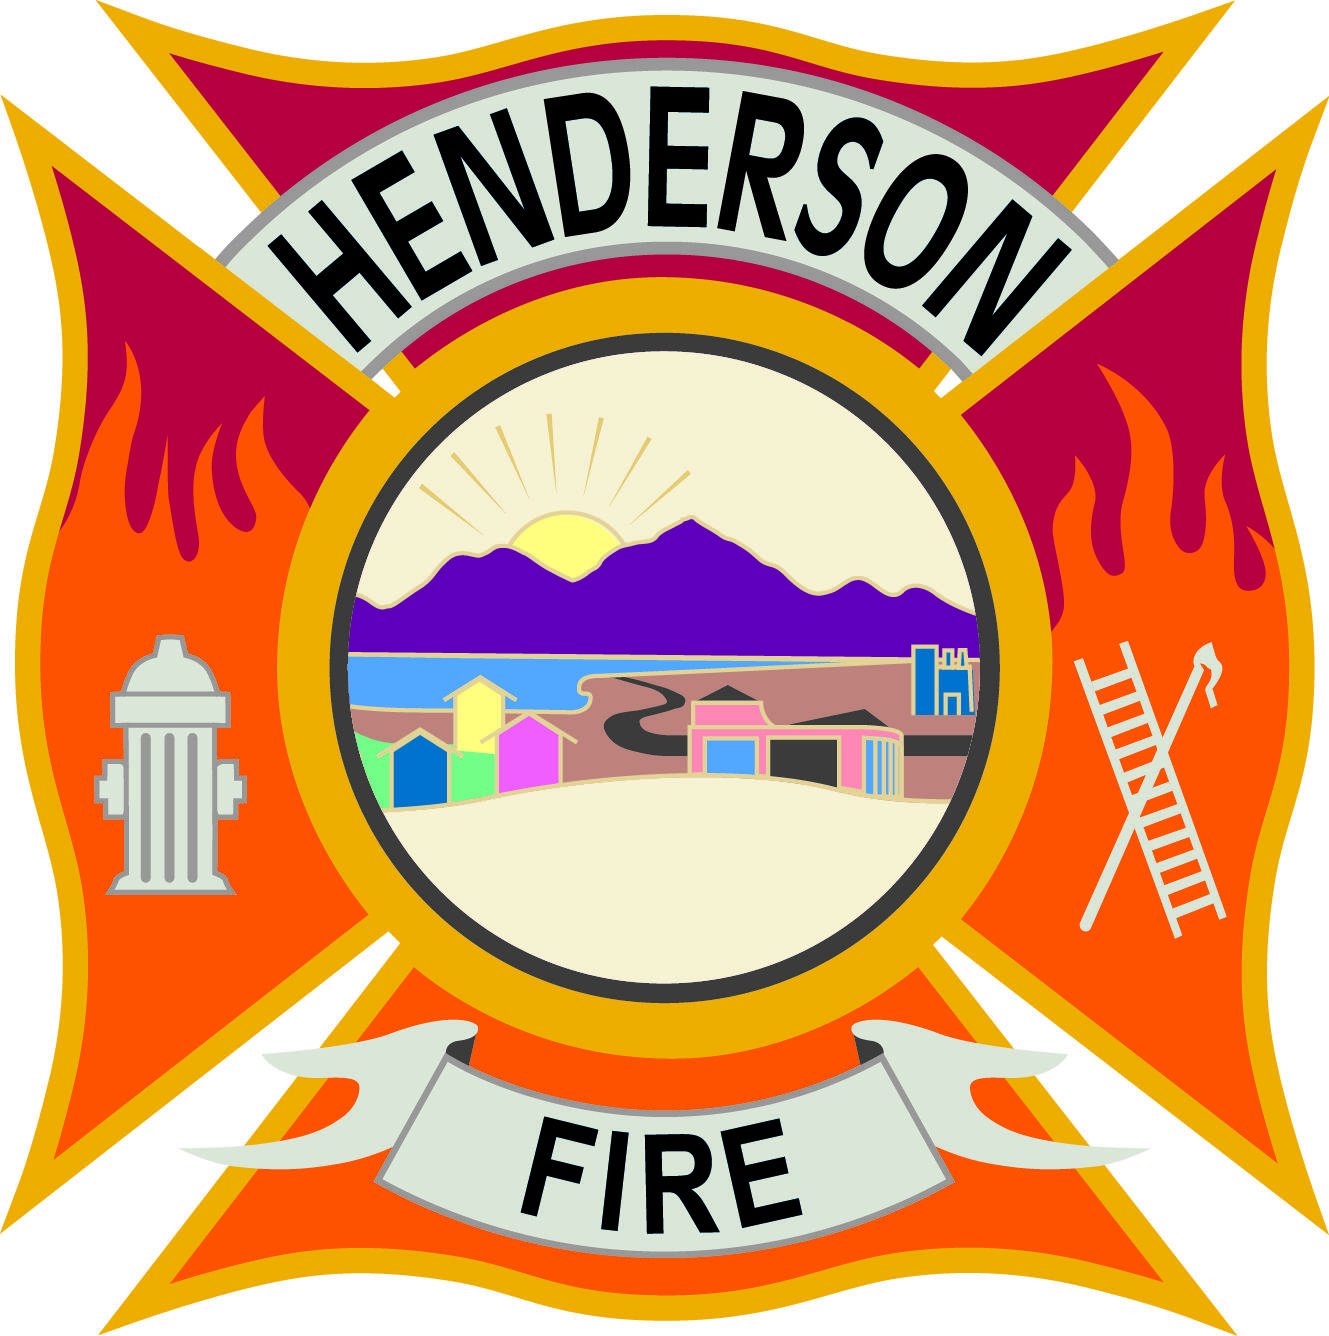 Henderson Fire Department 34 Crime And Safety Updates Nextdoor